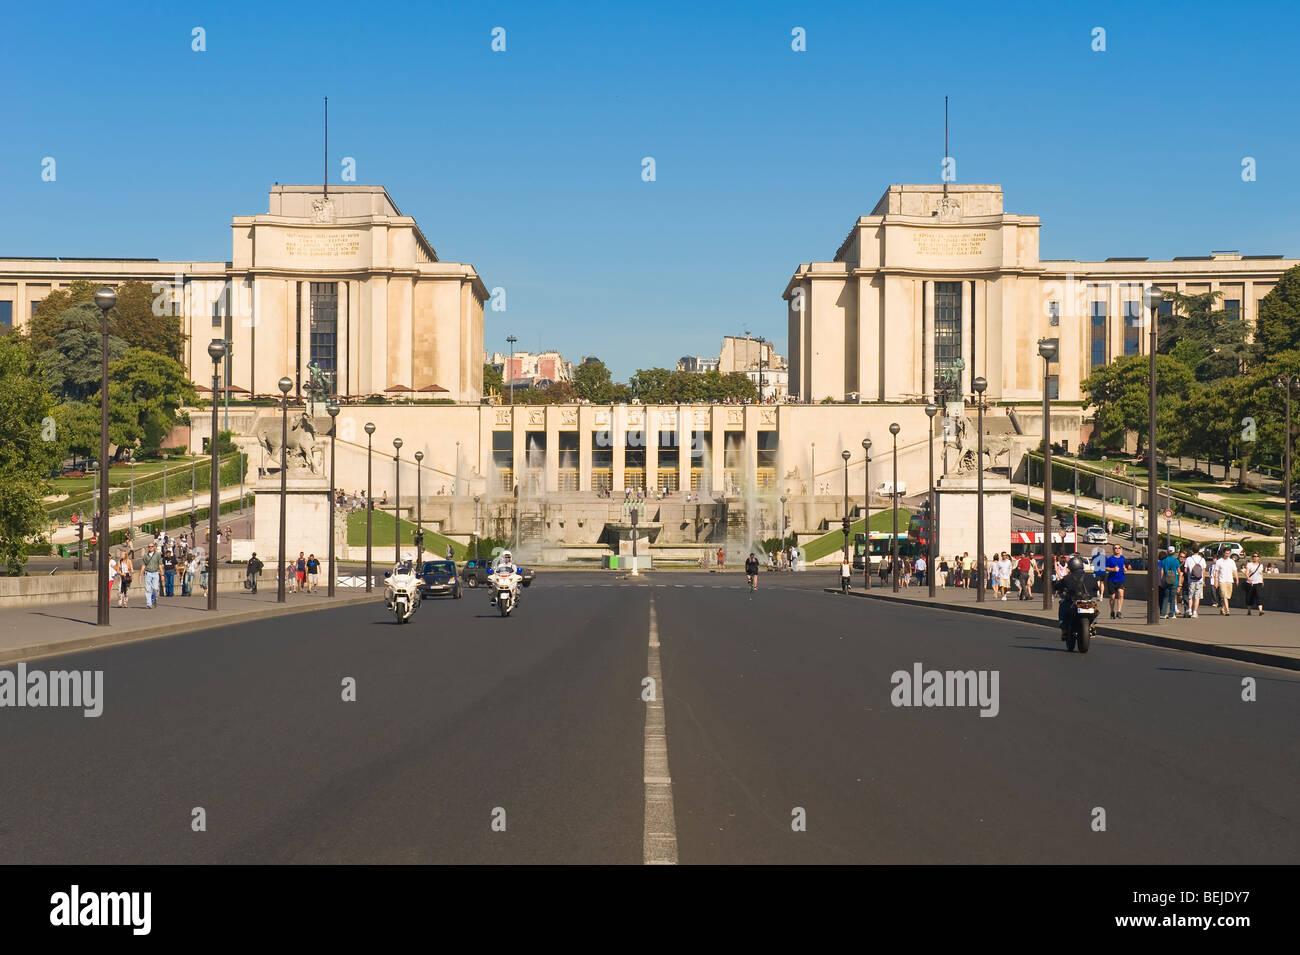 Palais de Chaillot and the Trocadero Gardens, Paris, France - Stock Image